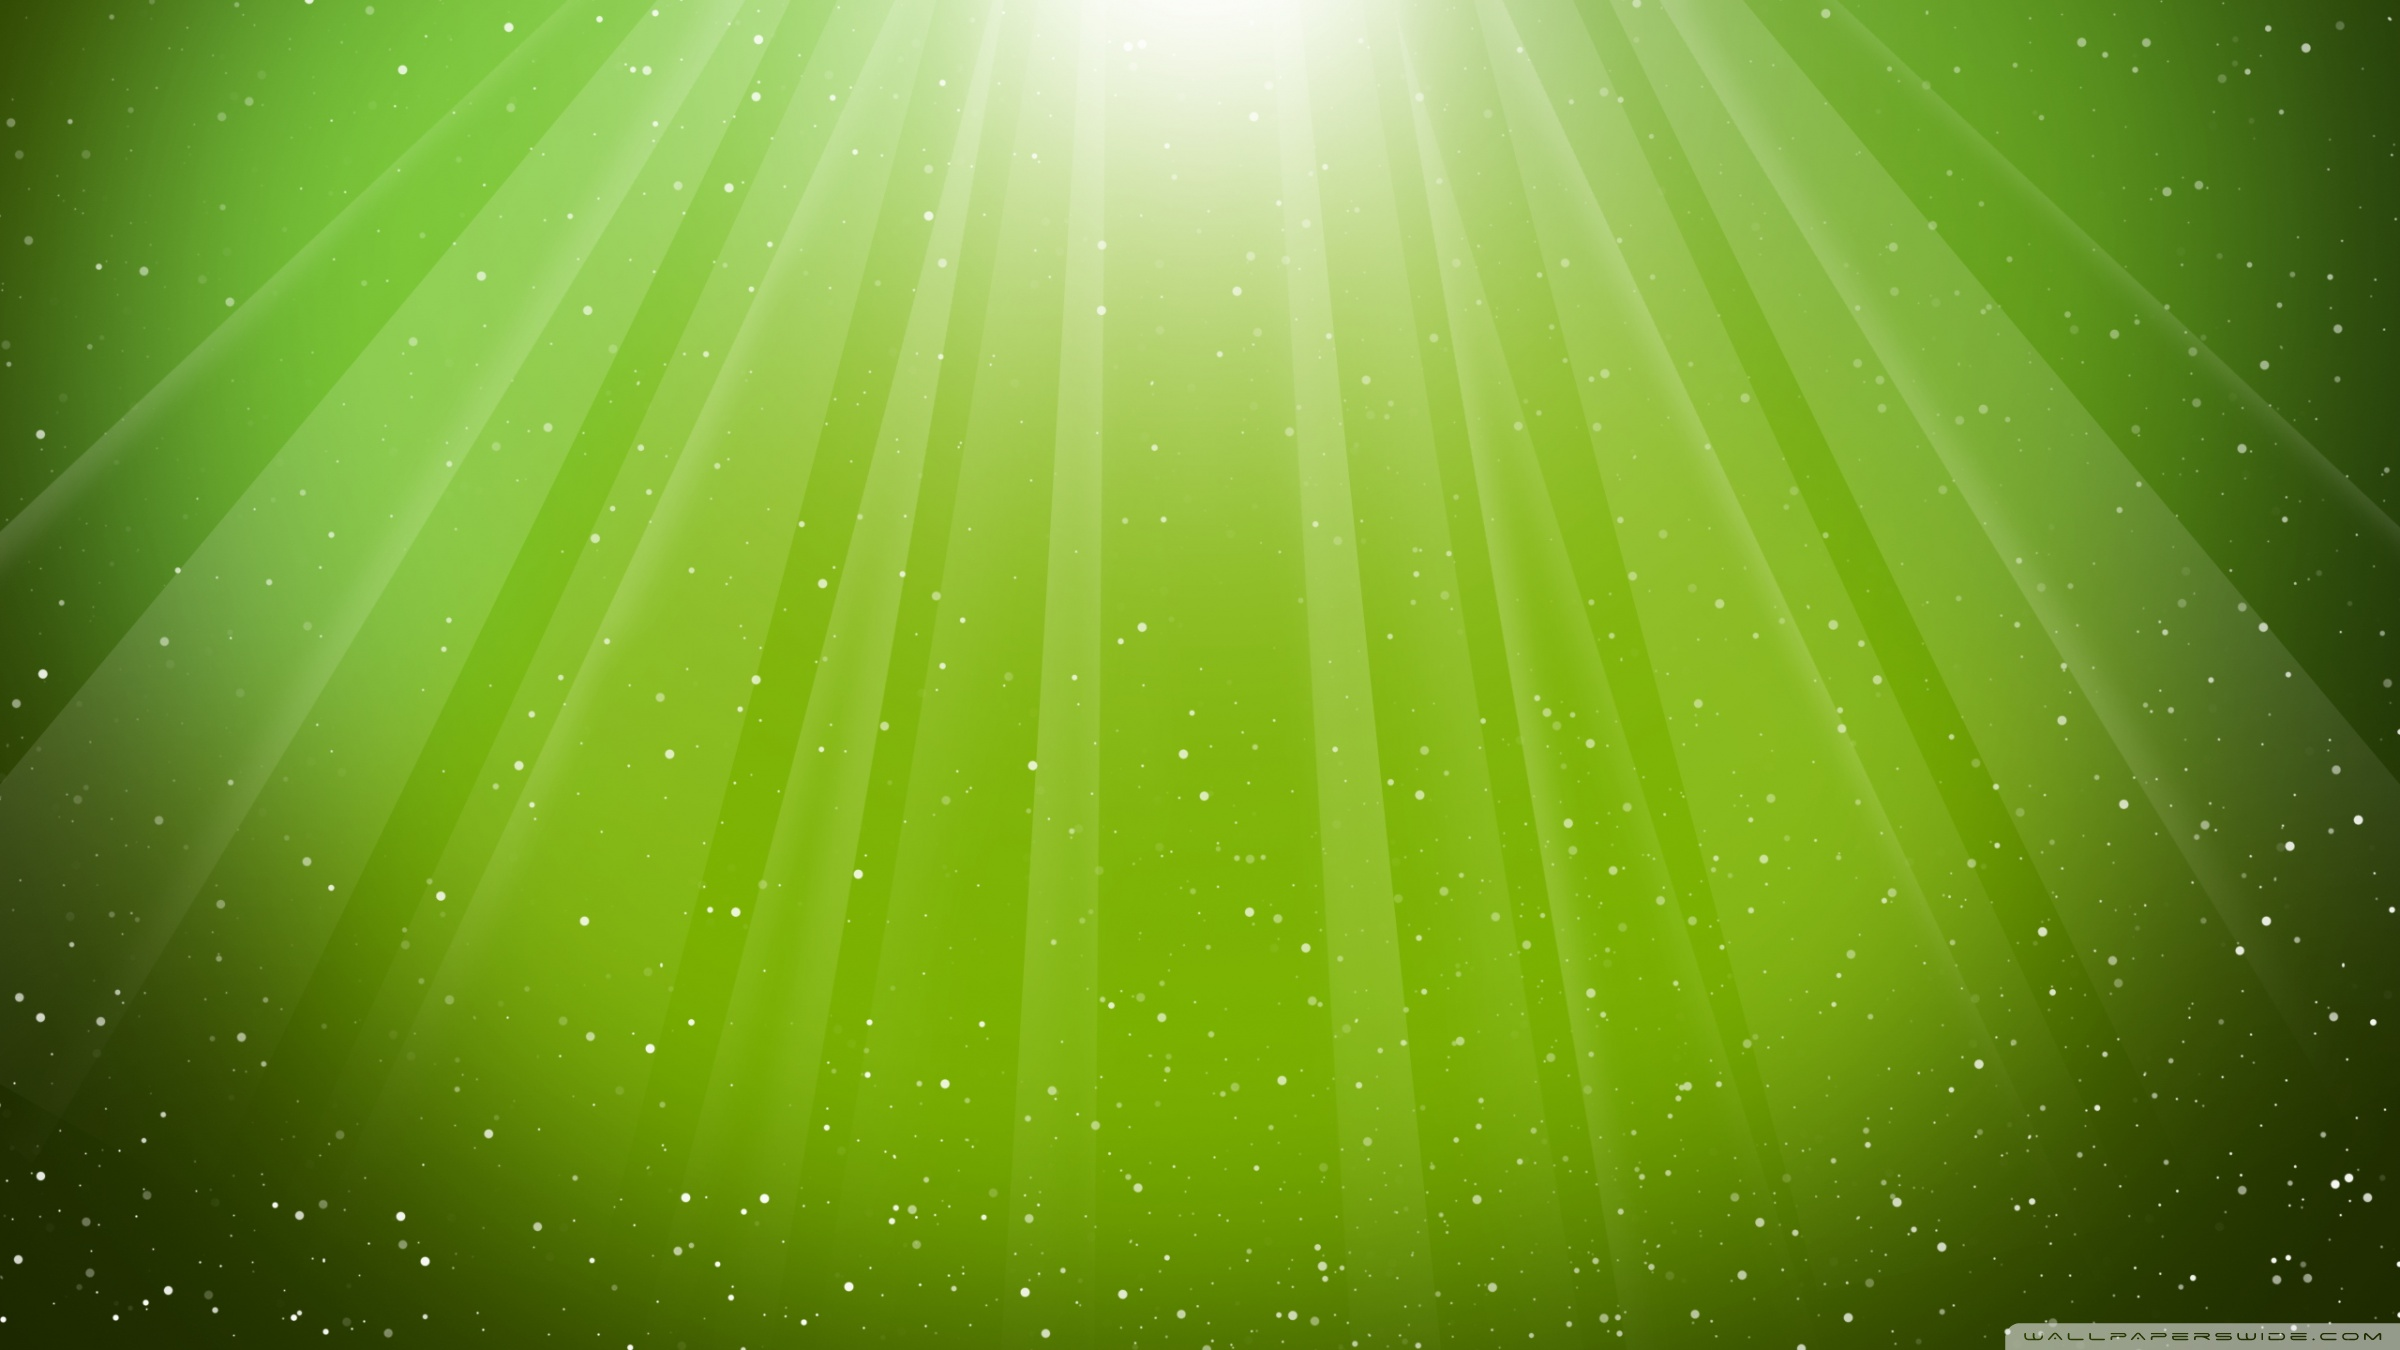 Hd wallpaper green - Hd Lime Green Backgrounds Pixelstalknet